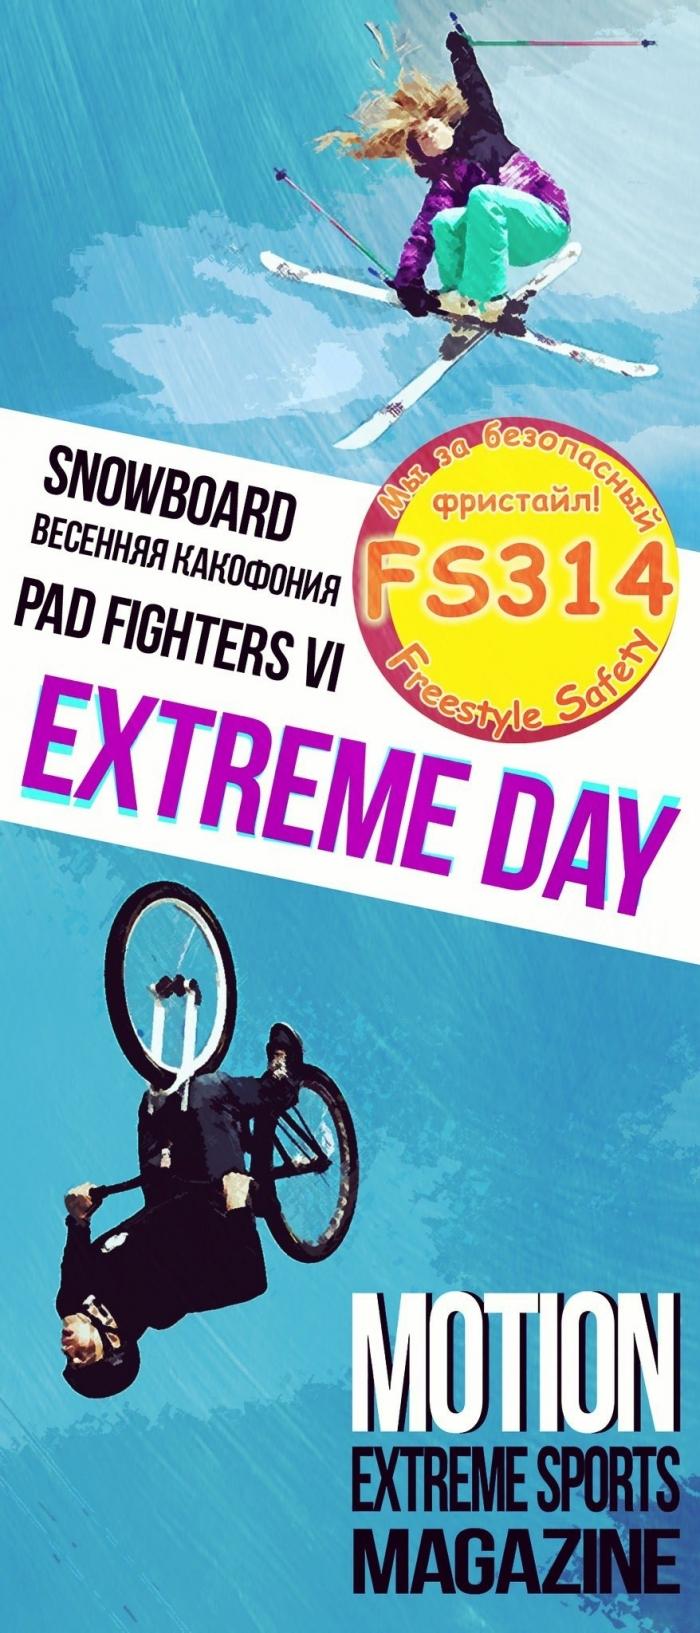 Наши гонки: Extreme Day - FS314 - 7-е марта